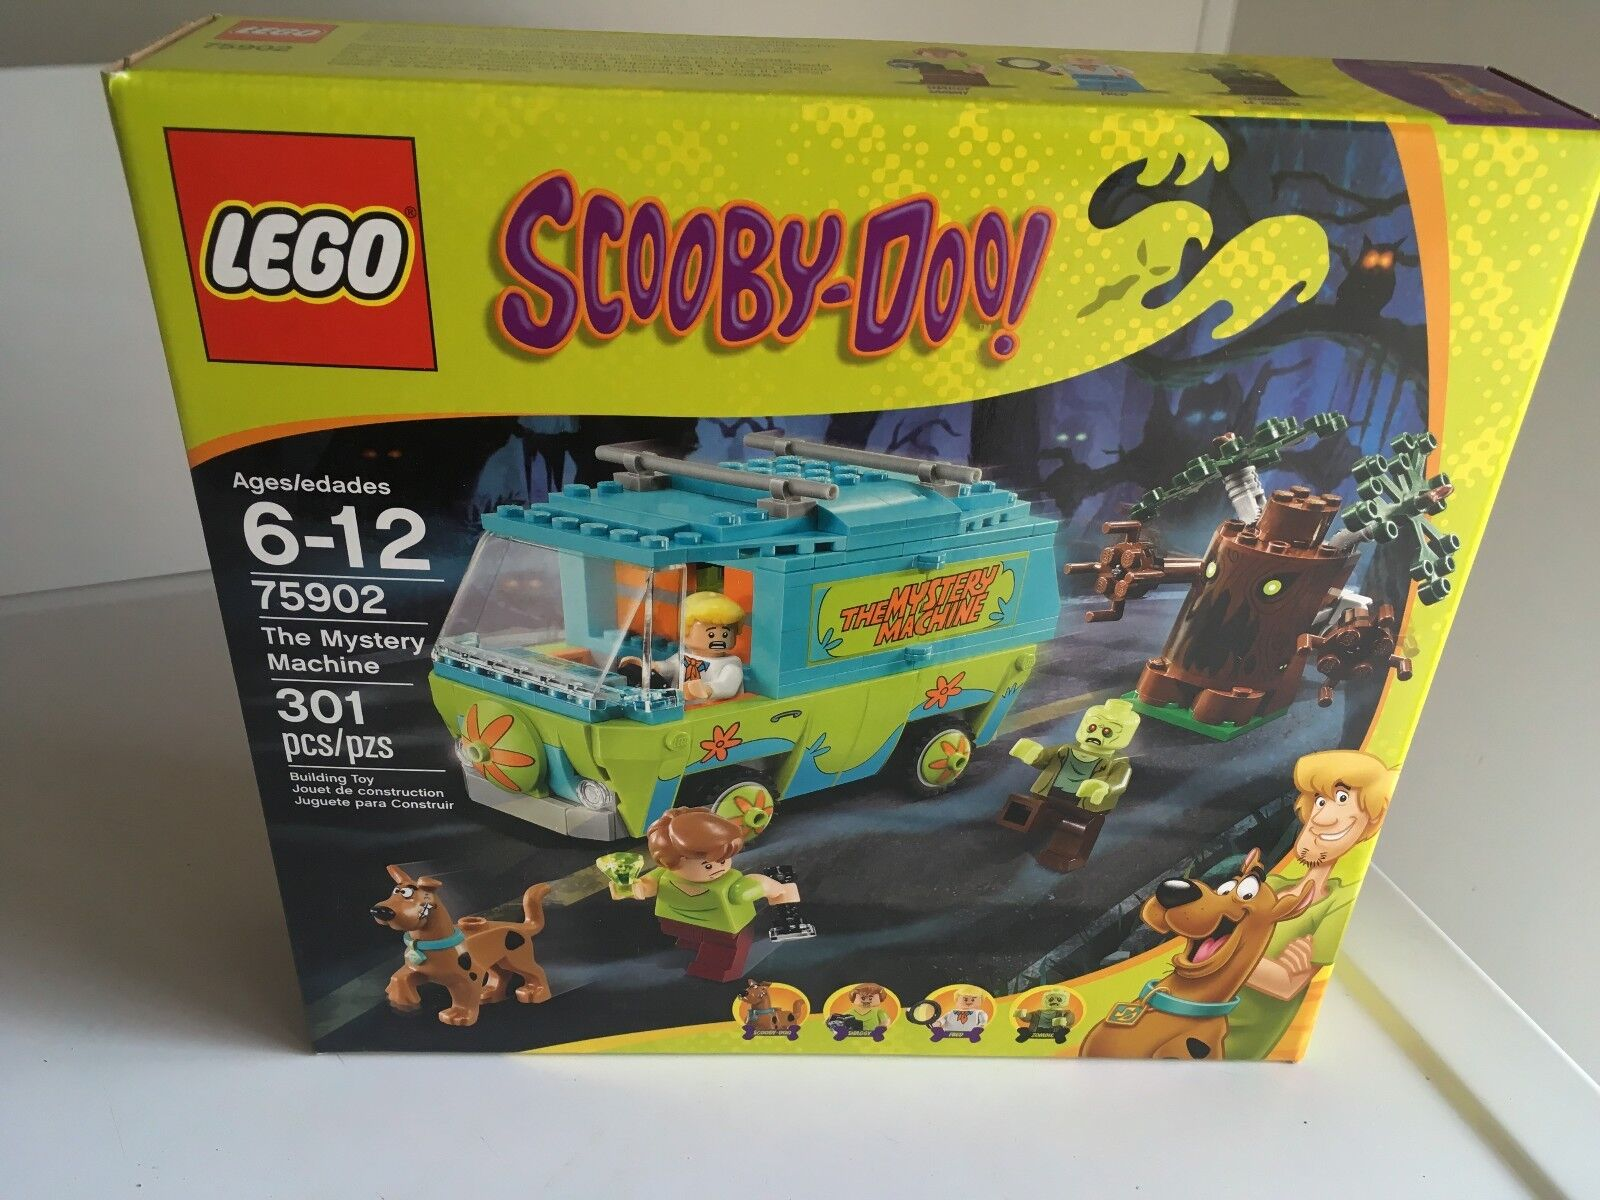 Lego - LEGO Scooby-Doo 75902 The Mystery Machine Brand New!!